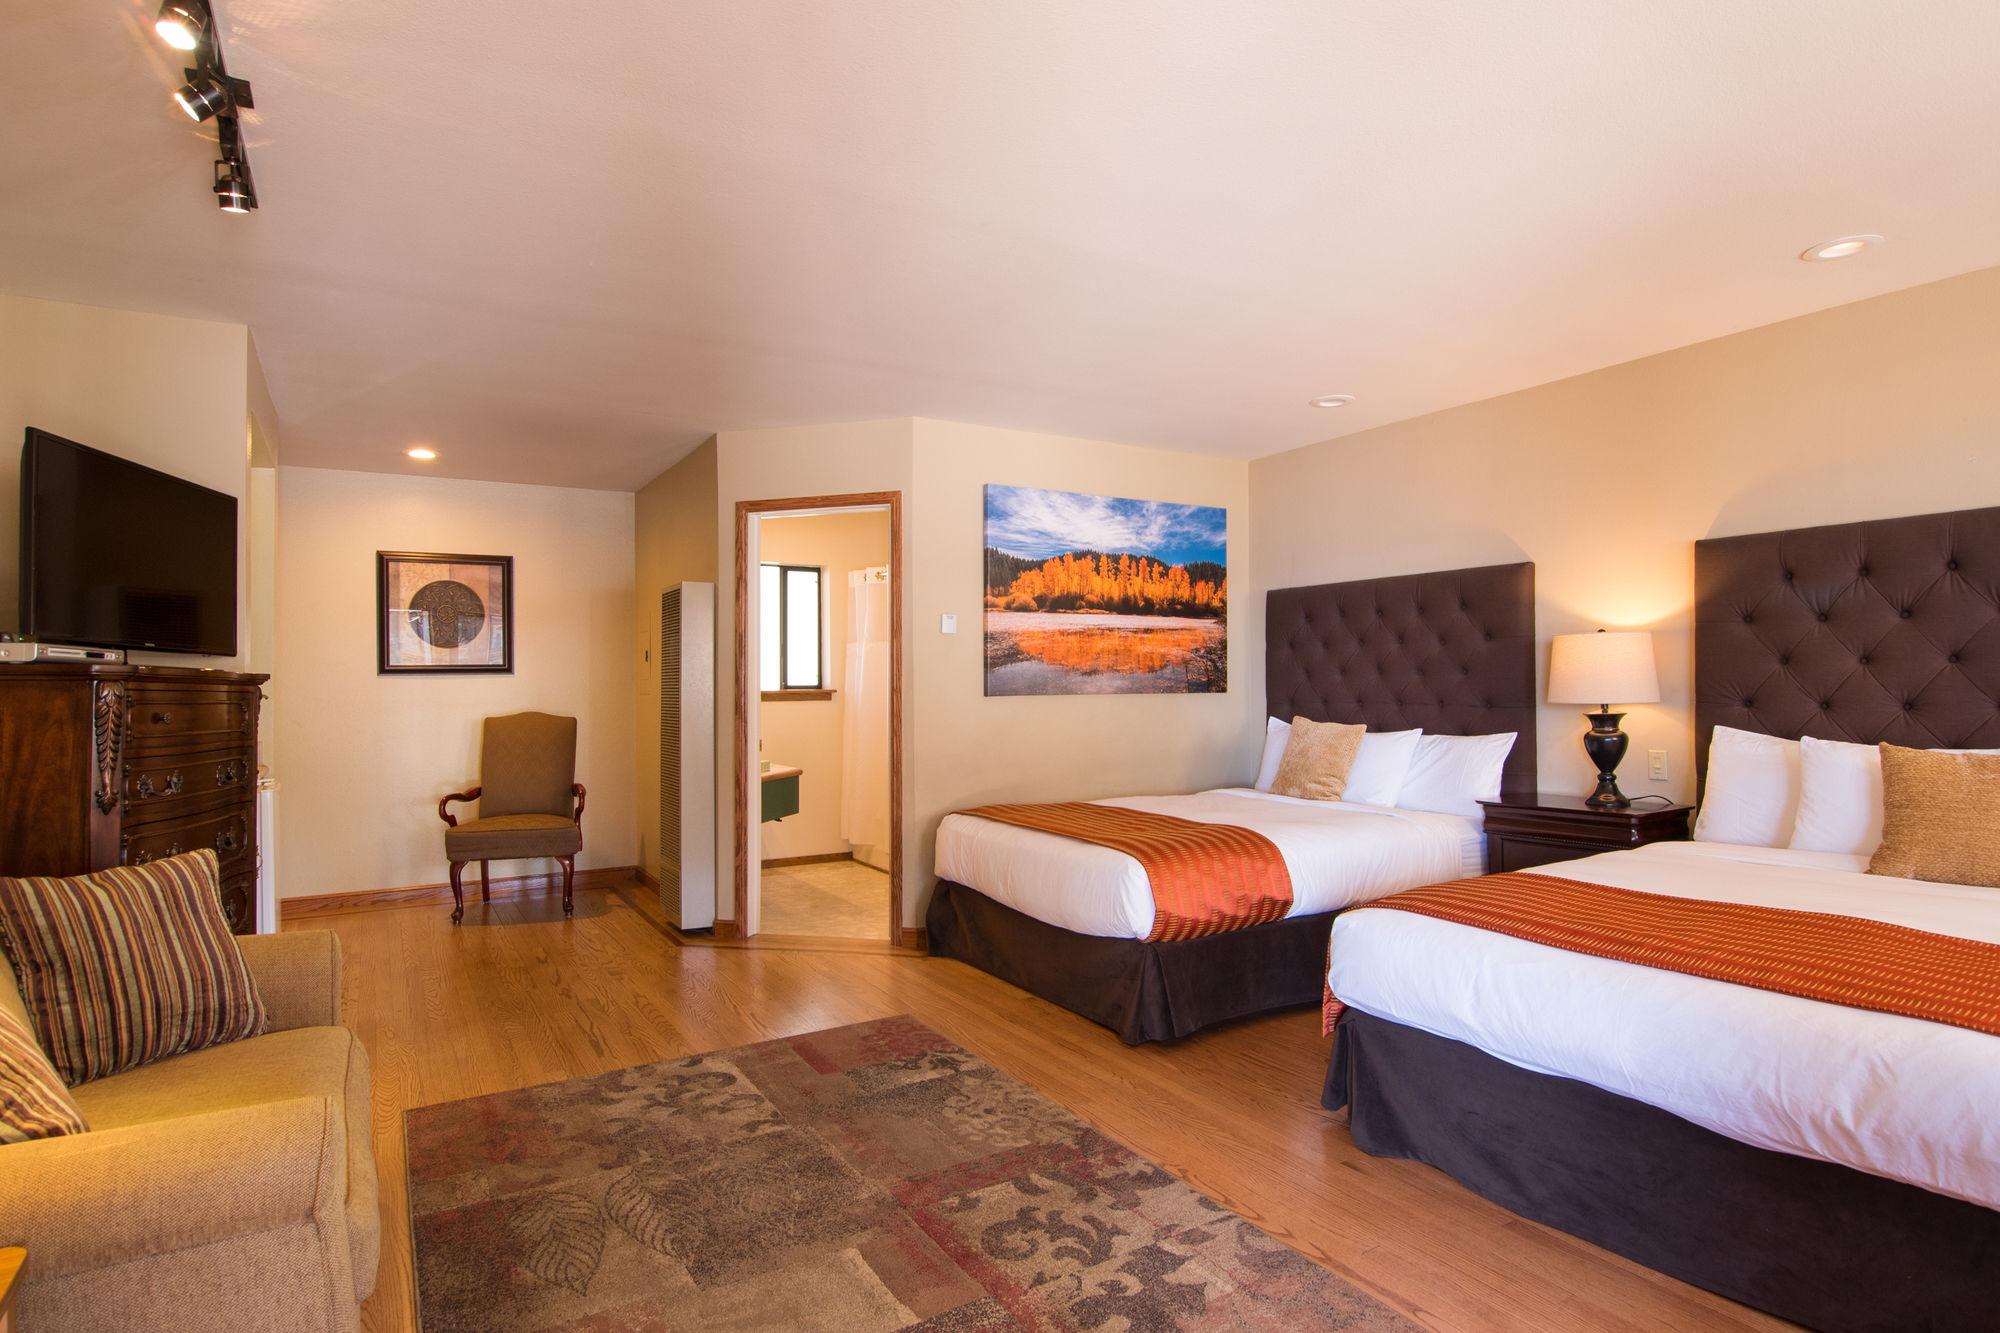 Lake tahoe resort hotel promo code - Namco discount code